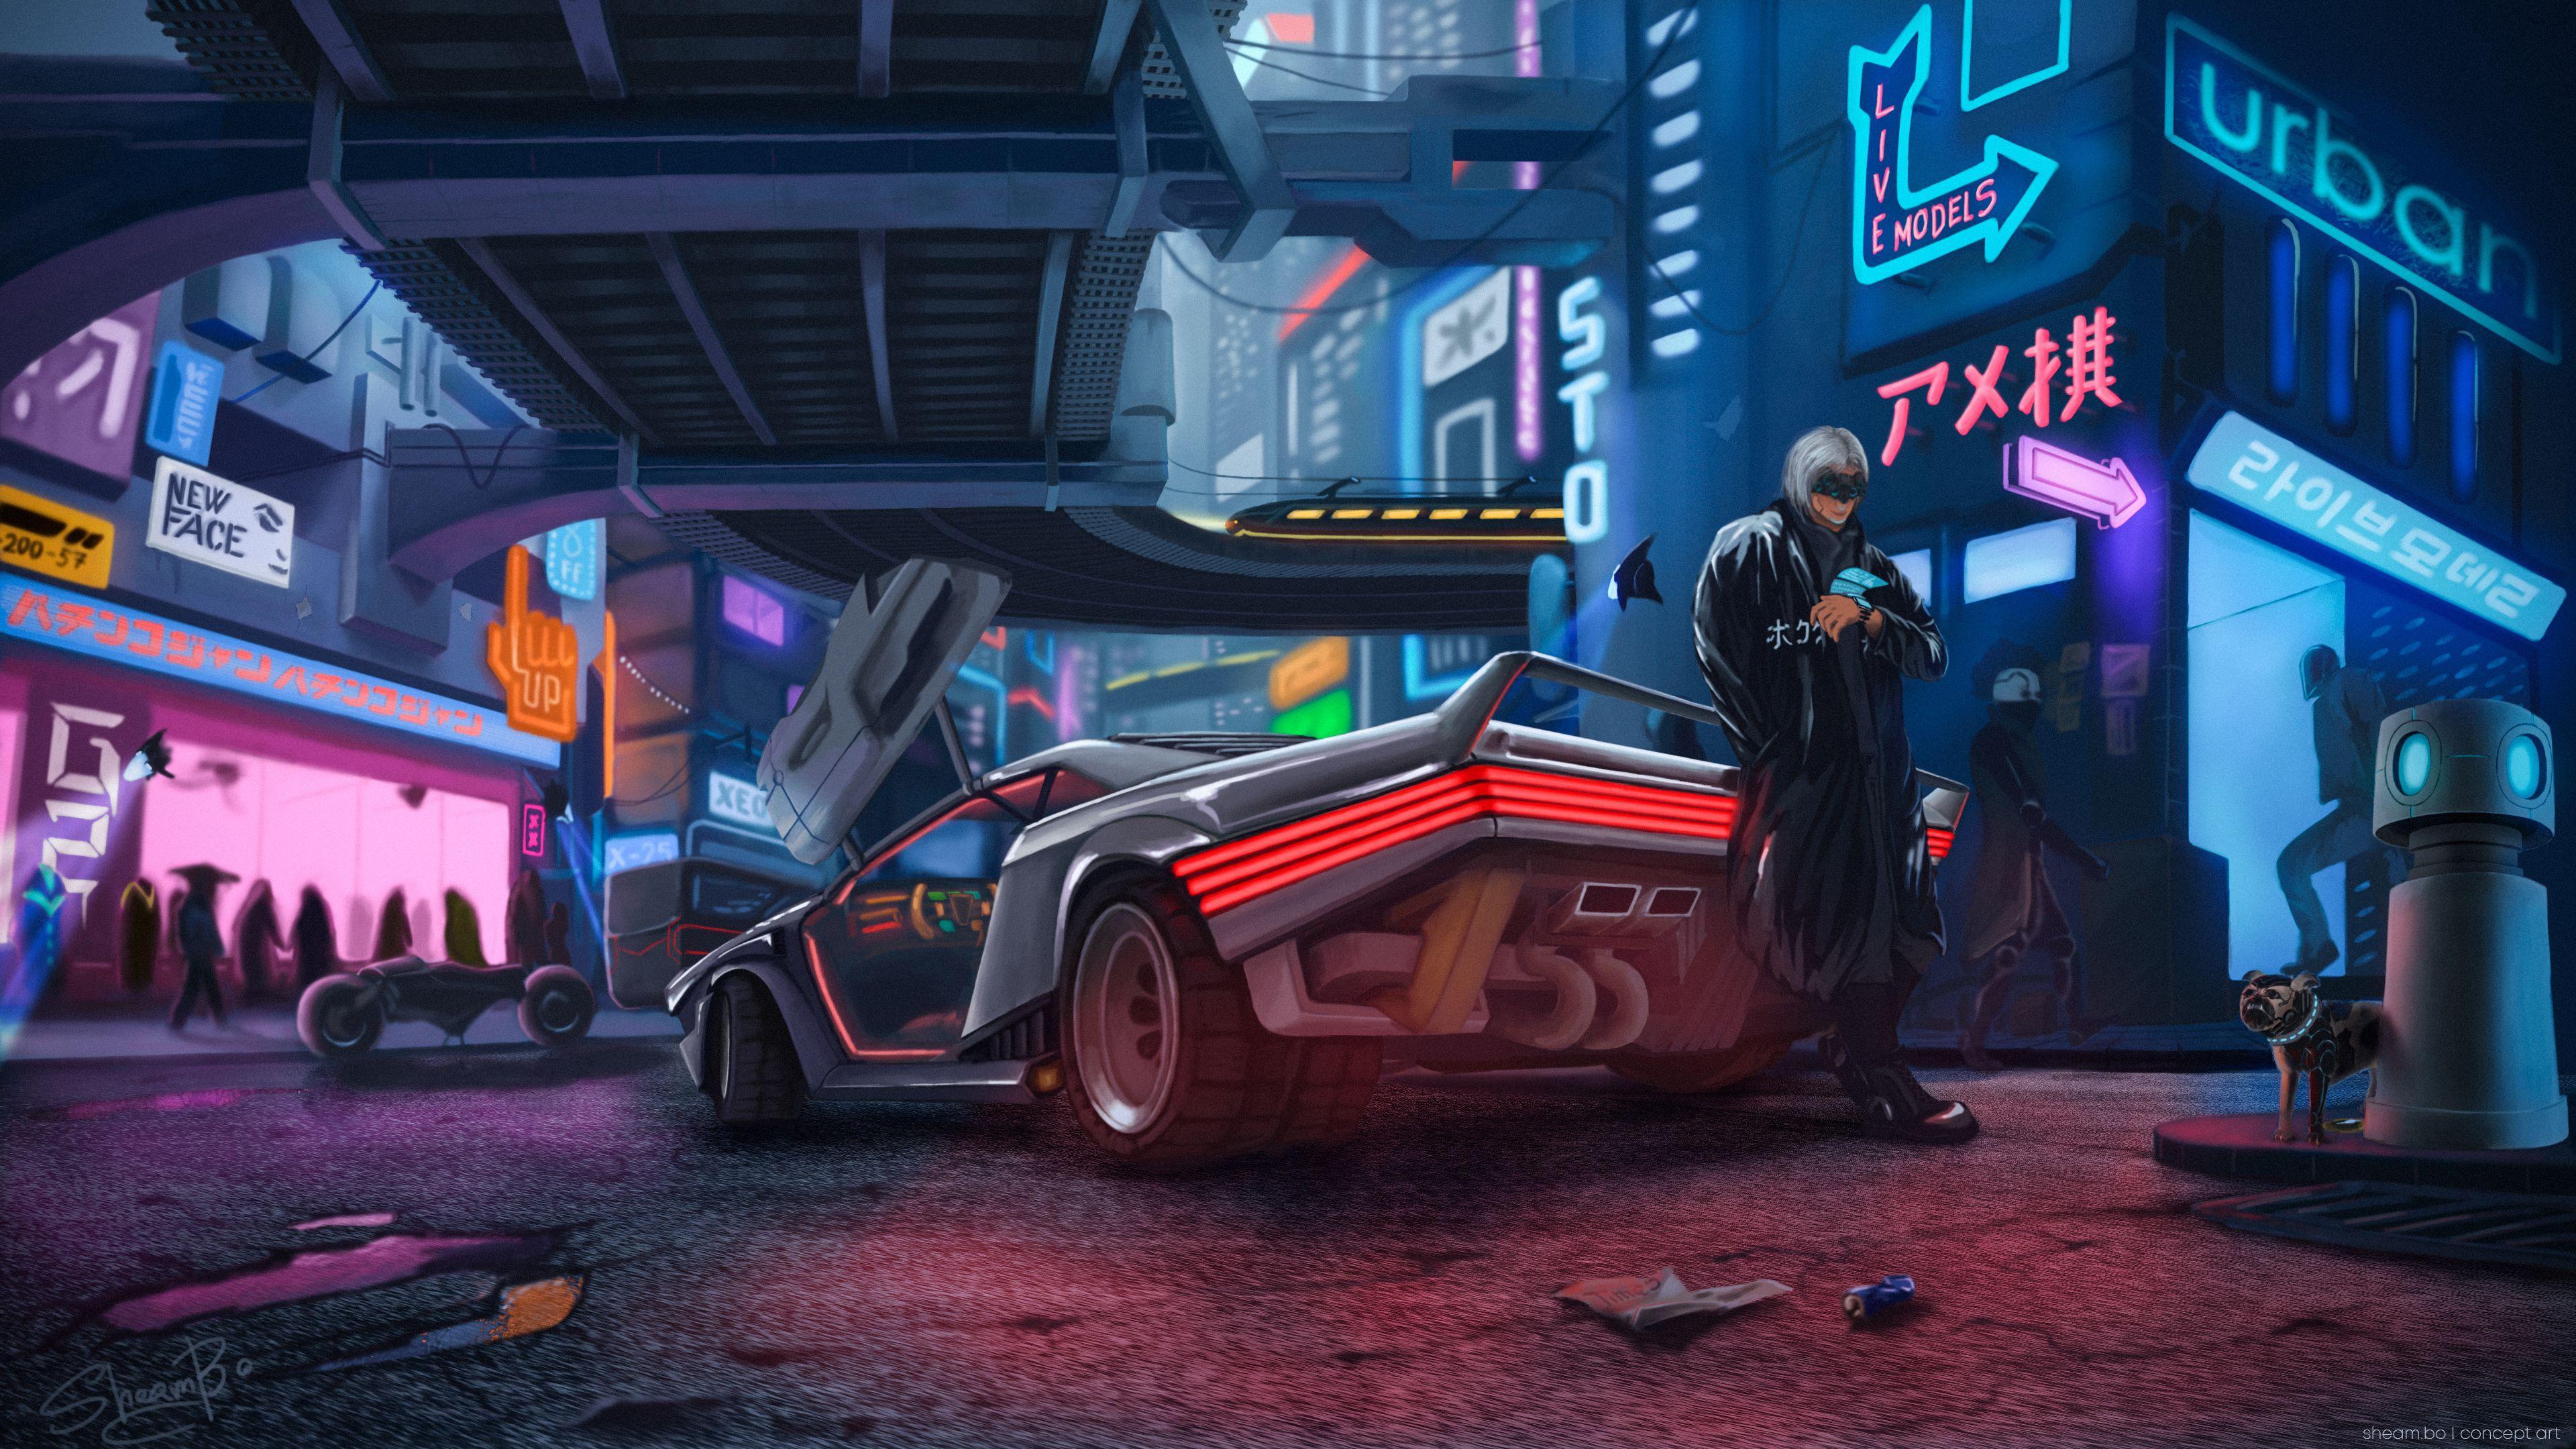 Cyberpunk Game Wallpapers Top Free Cyberpunk Game Backgrounds Wallpaperaccess